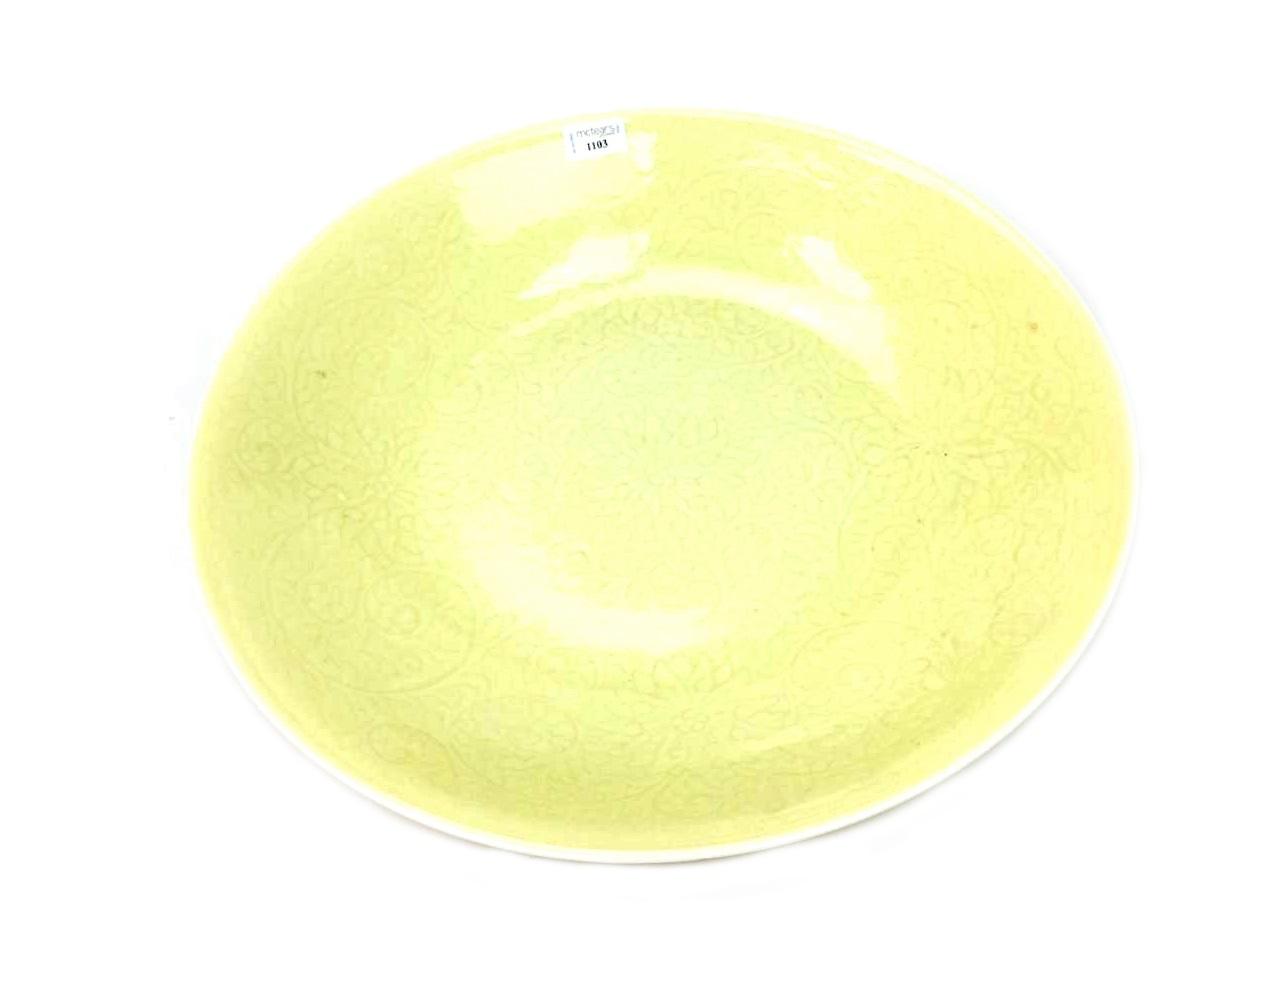 Lot 1103 - A 20TH CENTURY CHINESE CIRCULAR YELLOW GLAZED BOWL